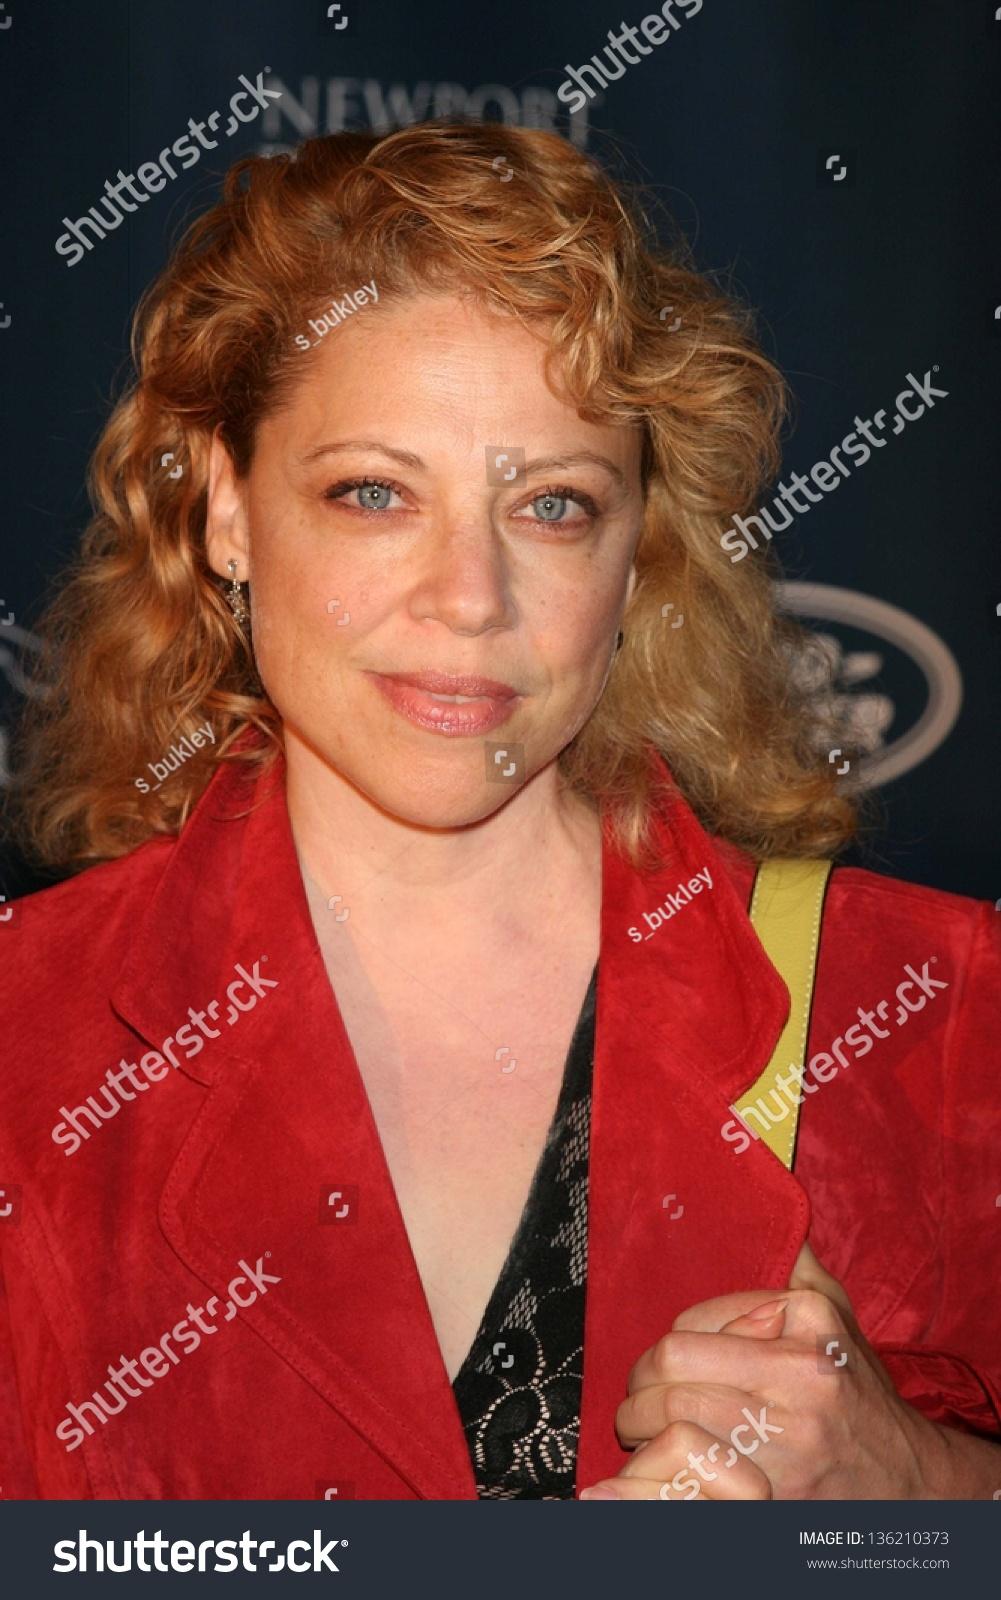 images Kathleen Kerrigan (actress)